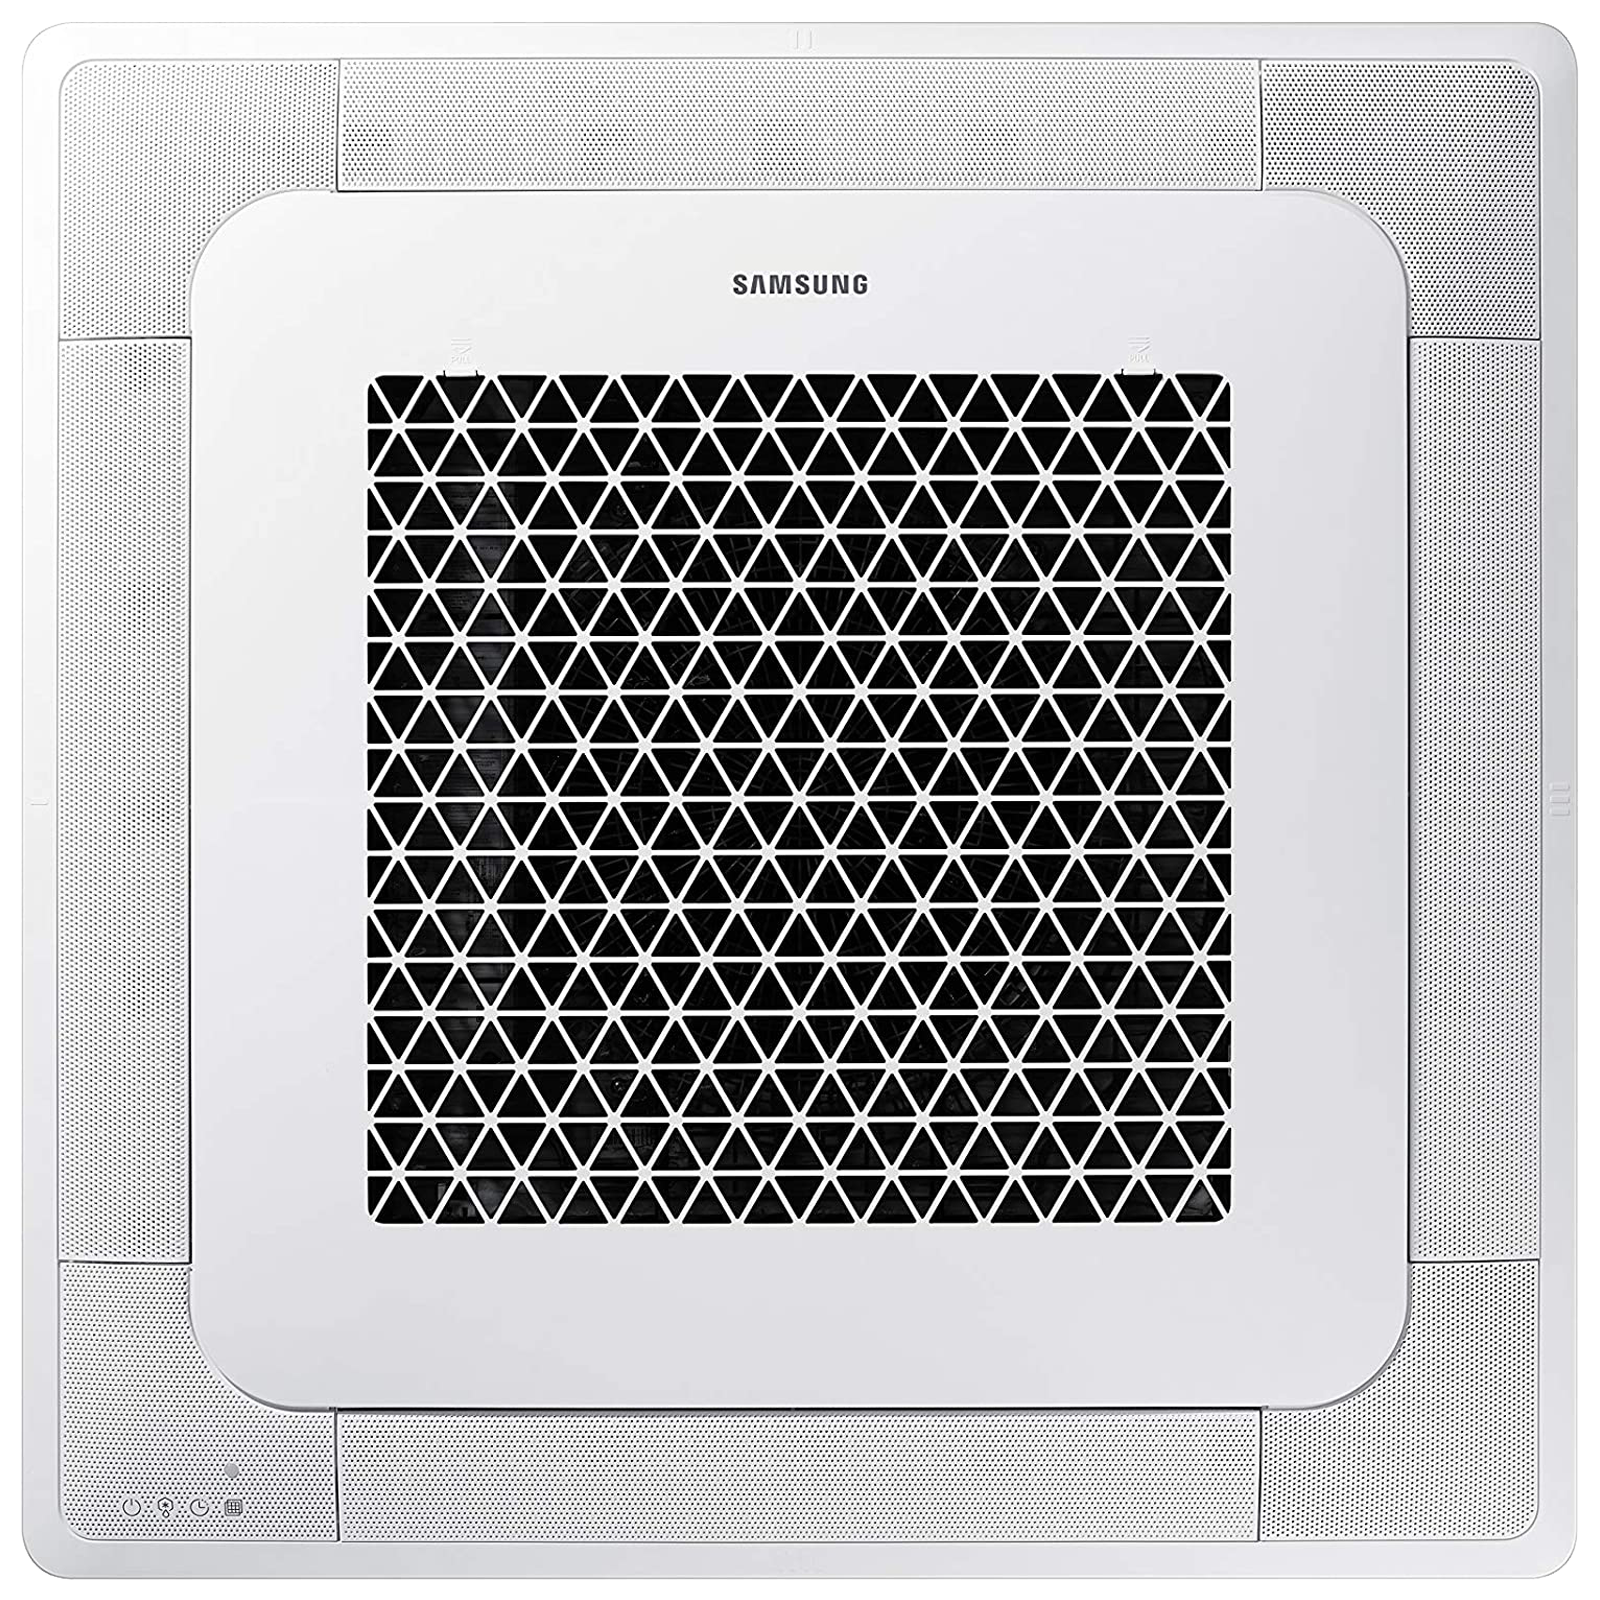 Samsung 4 Way 2 Ton 5 Star Inverter Cassette AC (Wi-Fi AC, Copper Condenser, AC071NN4DKC/TL, White)_1